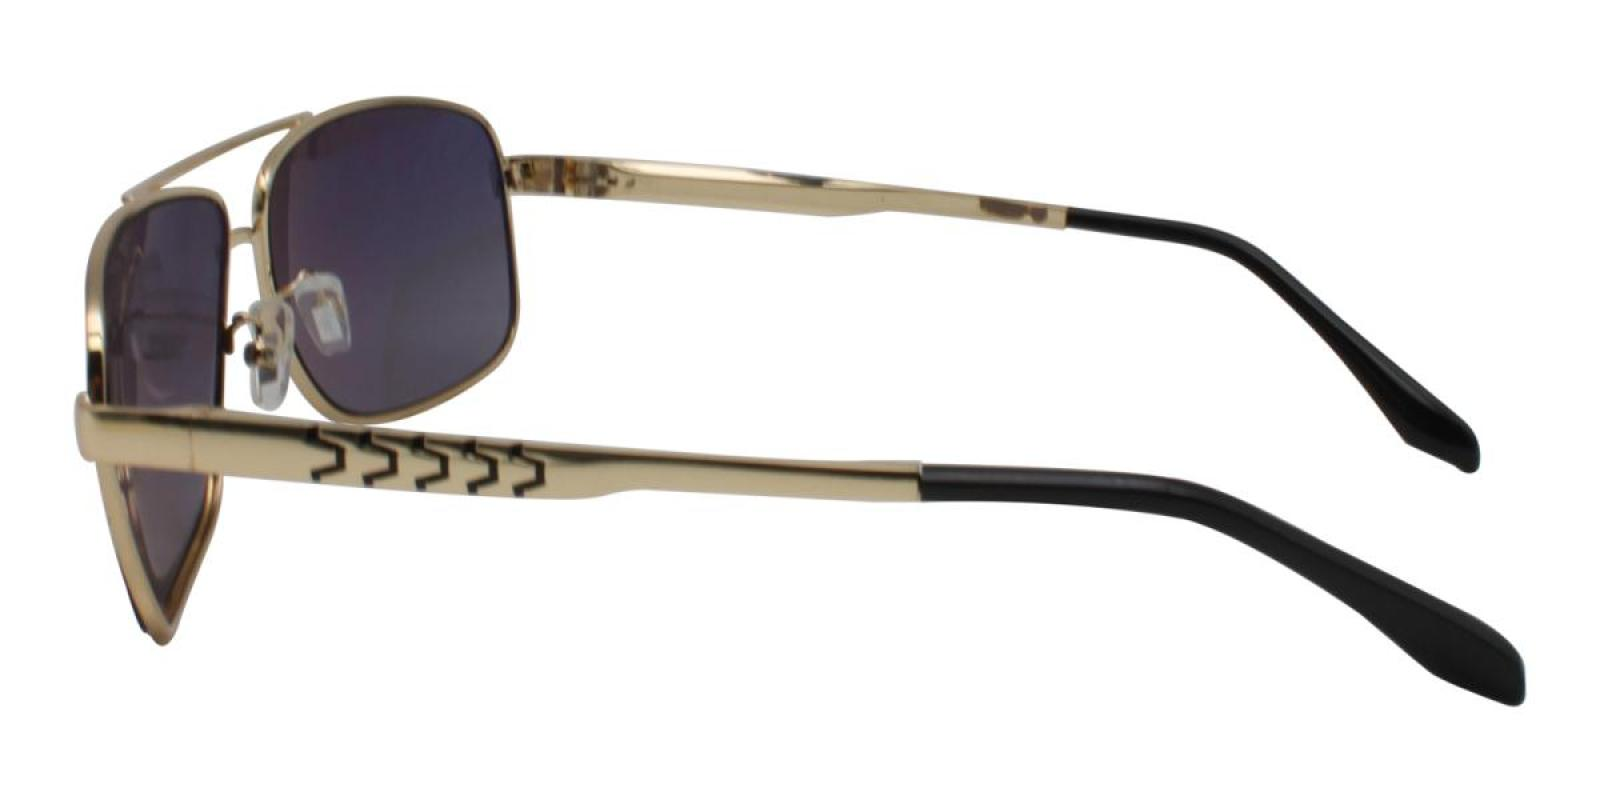 Marchisio-Gold-Aviator-Metal-Sunglasses-additional3